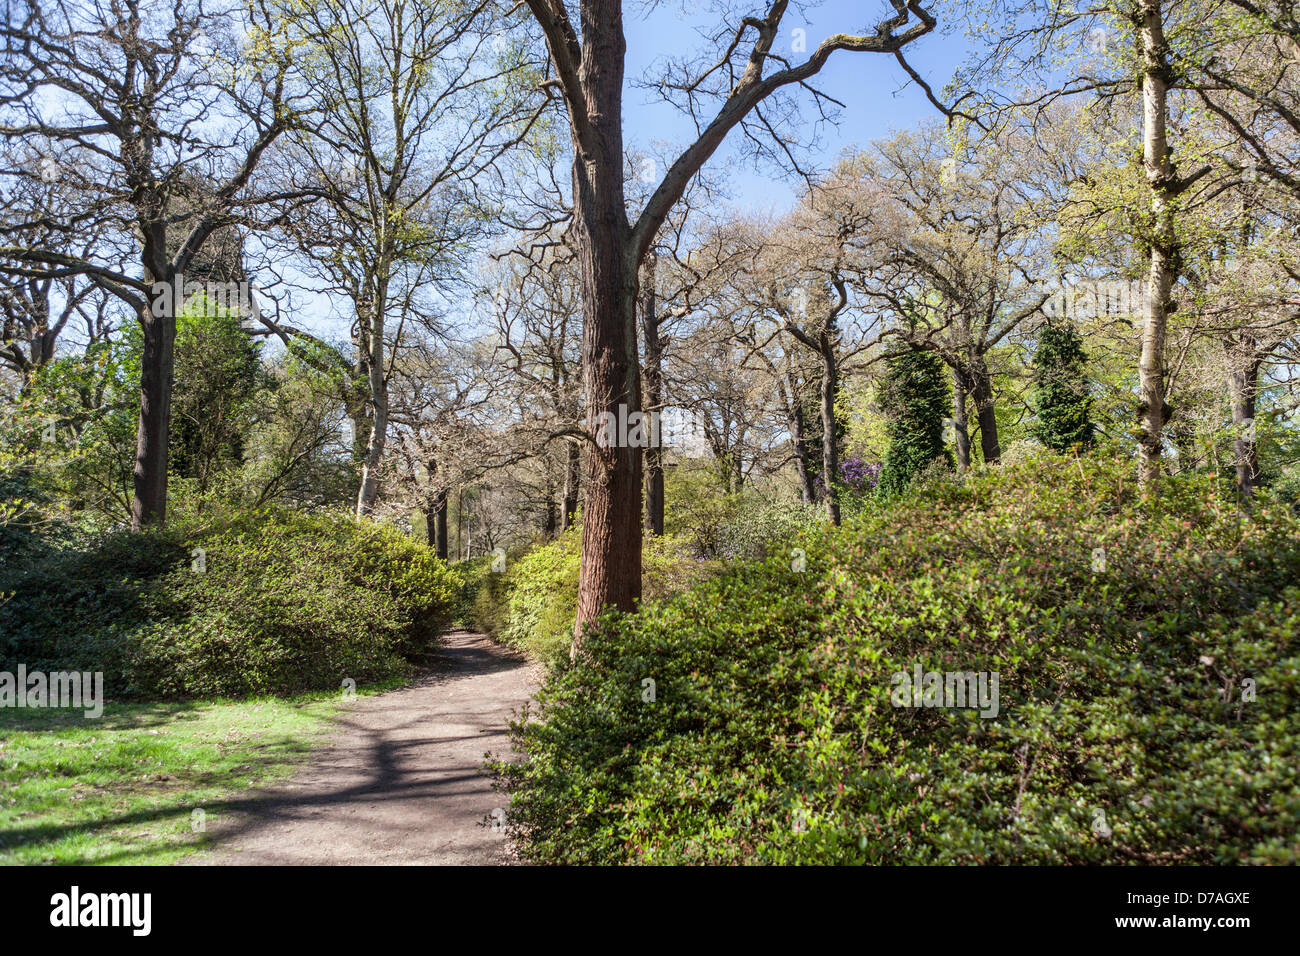 isabella plantation richmond park greater london uk 1st may 2013 spring